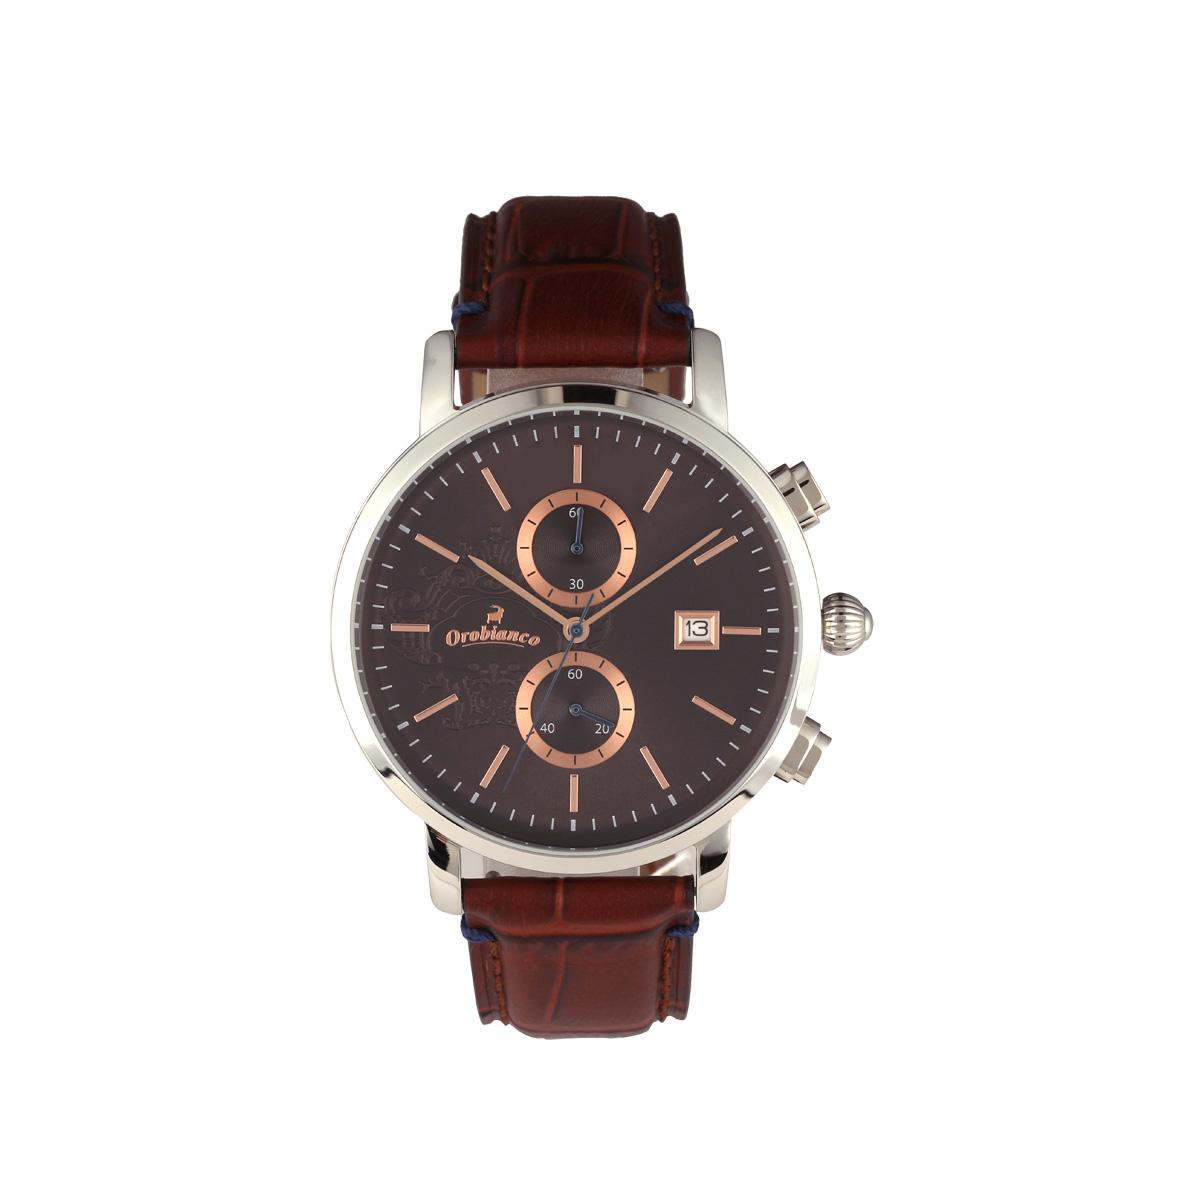 Orobianco CERTO オロビアンコ 時計 腕時計 メンズ クオーツ アナログ ブラウン OR0070-1